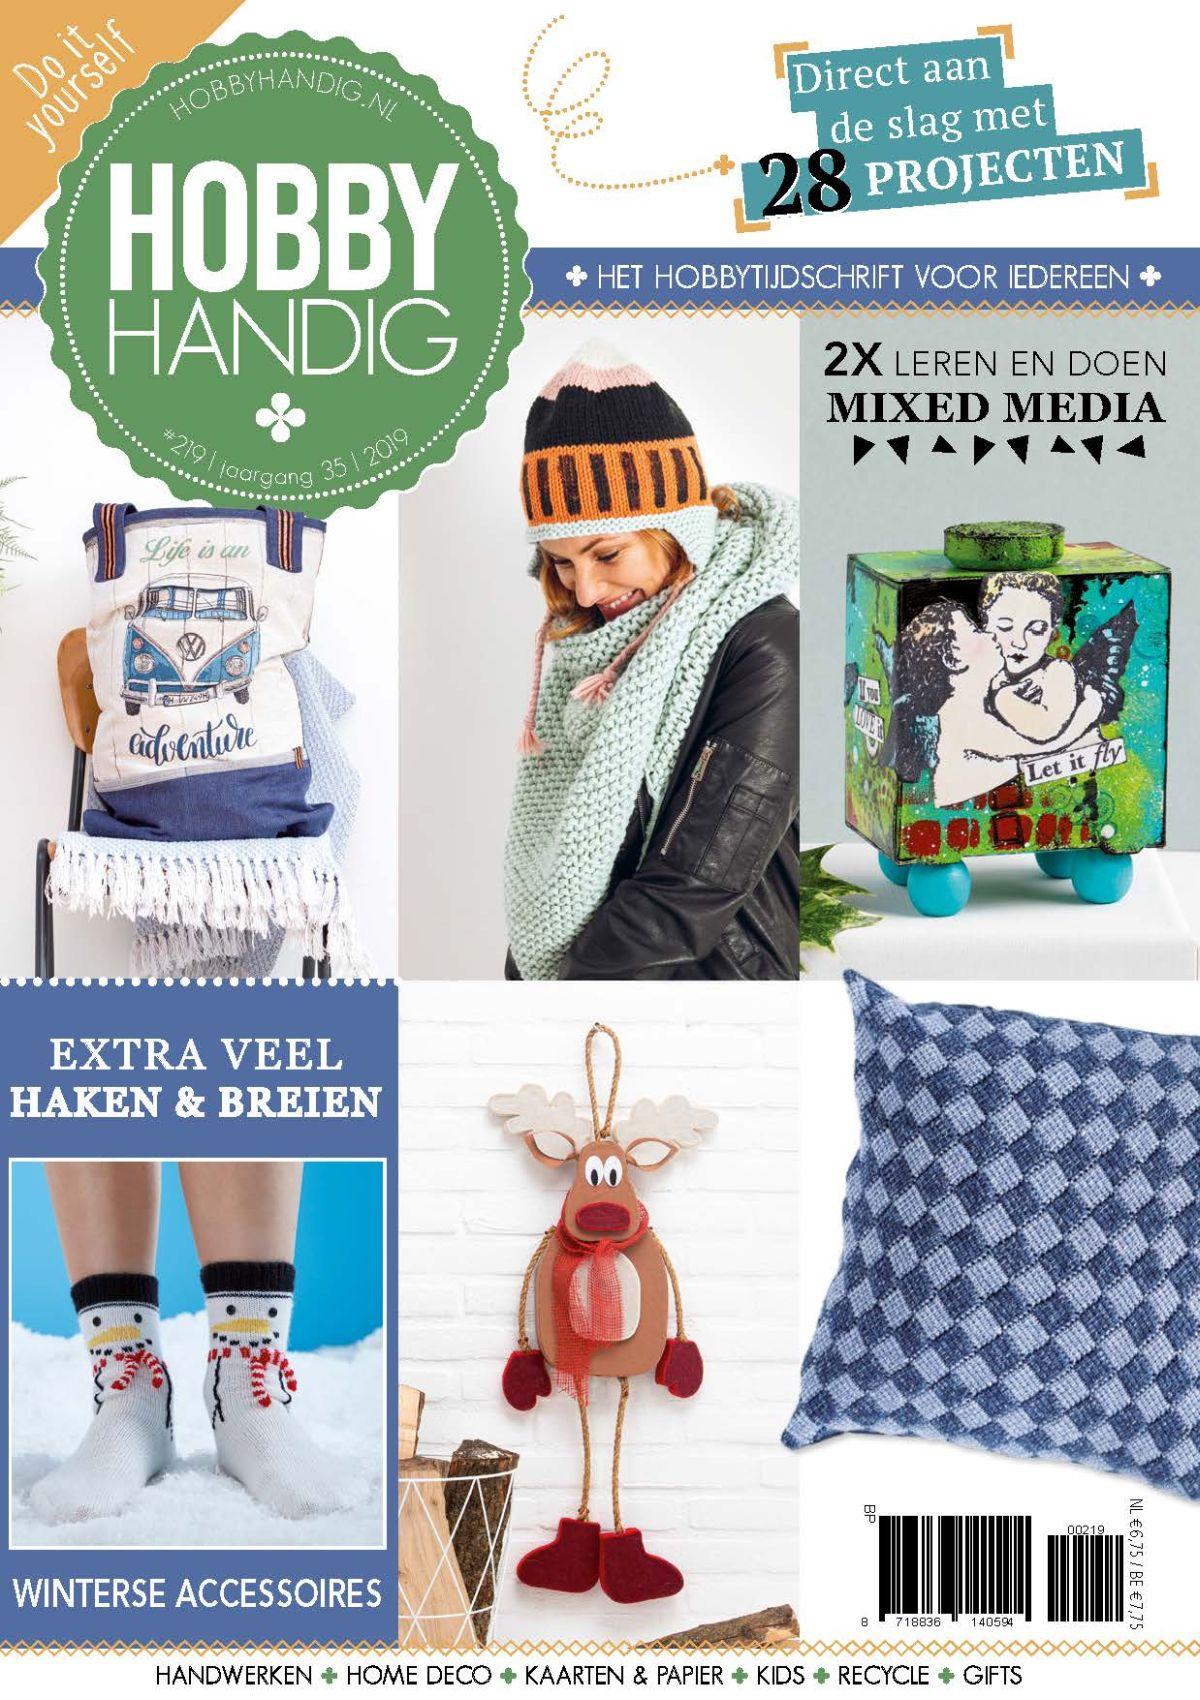 hobbyhandig, hobbybreed, DIY, winteraccesoires, winter, lifestyle